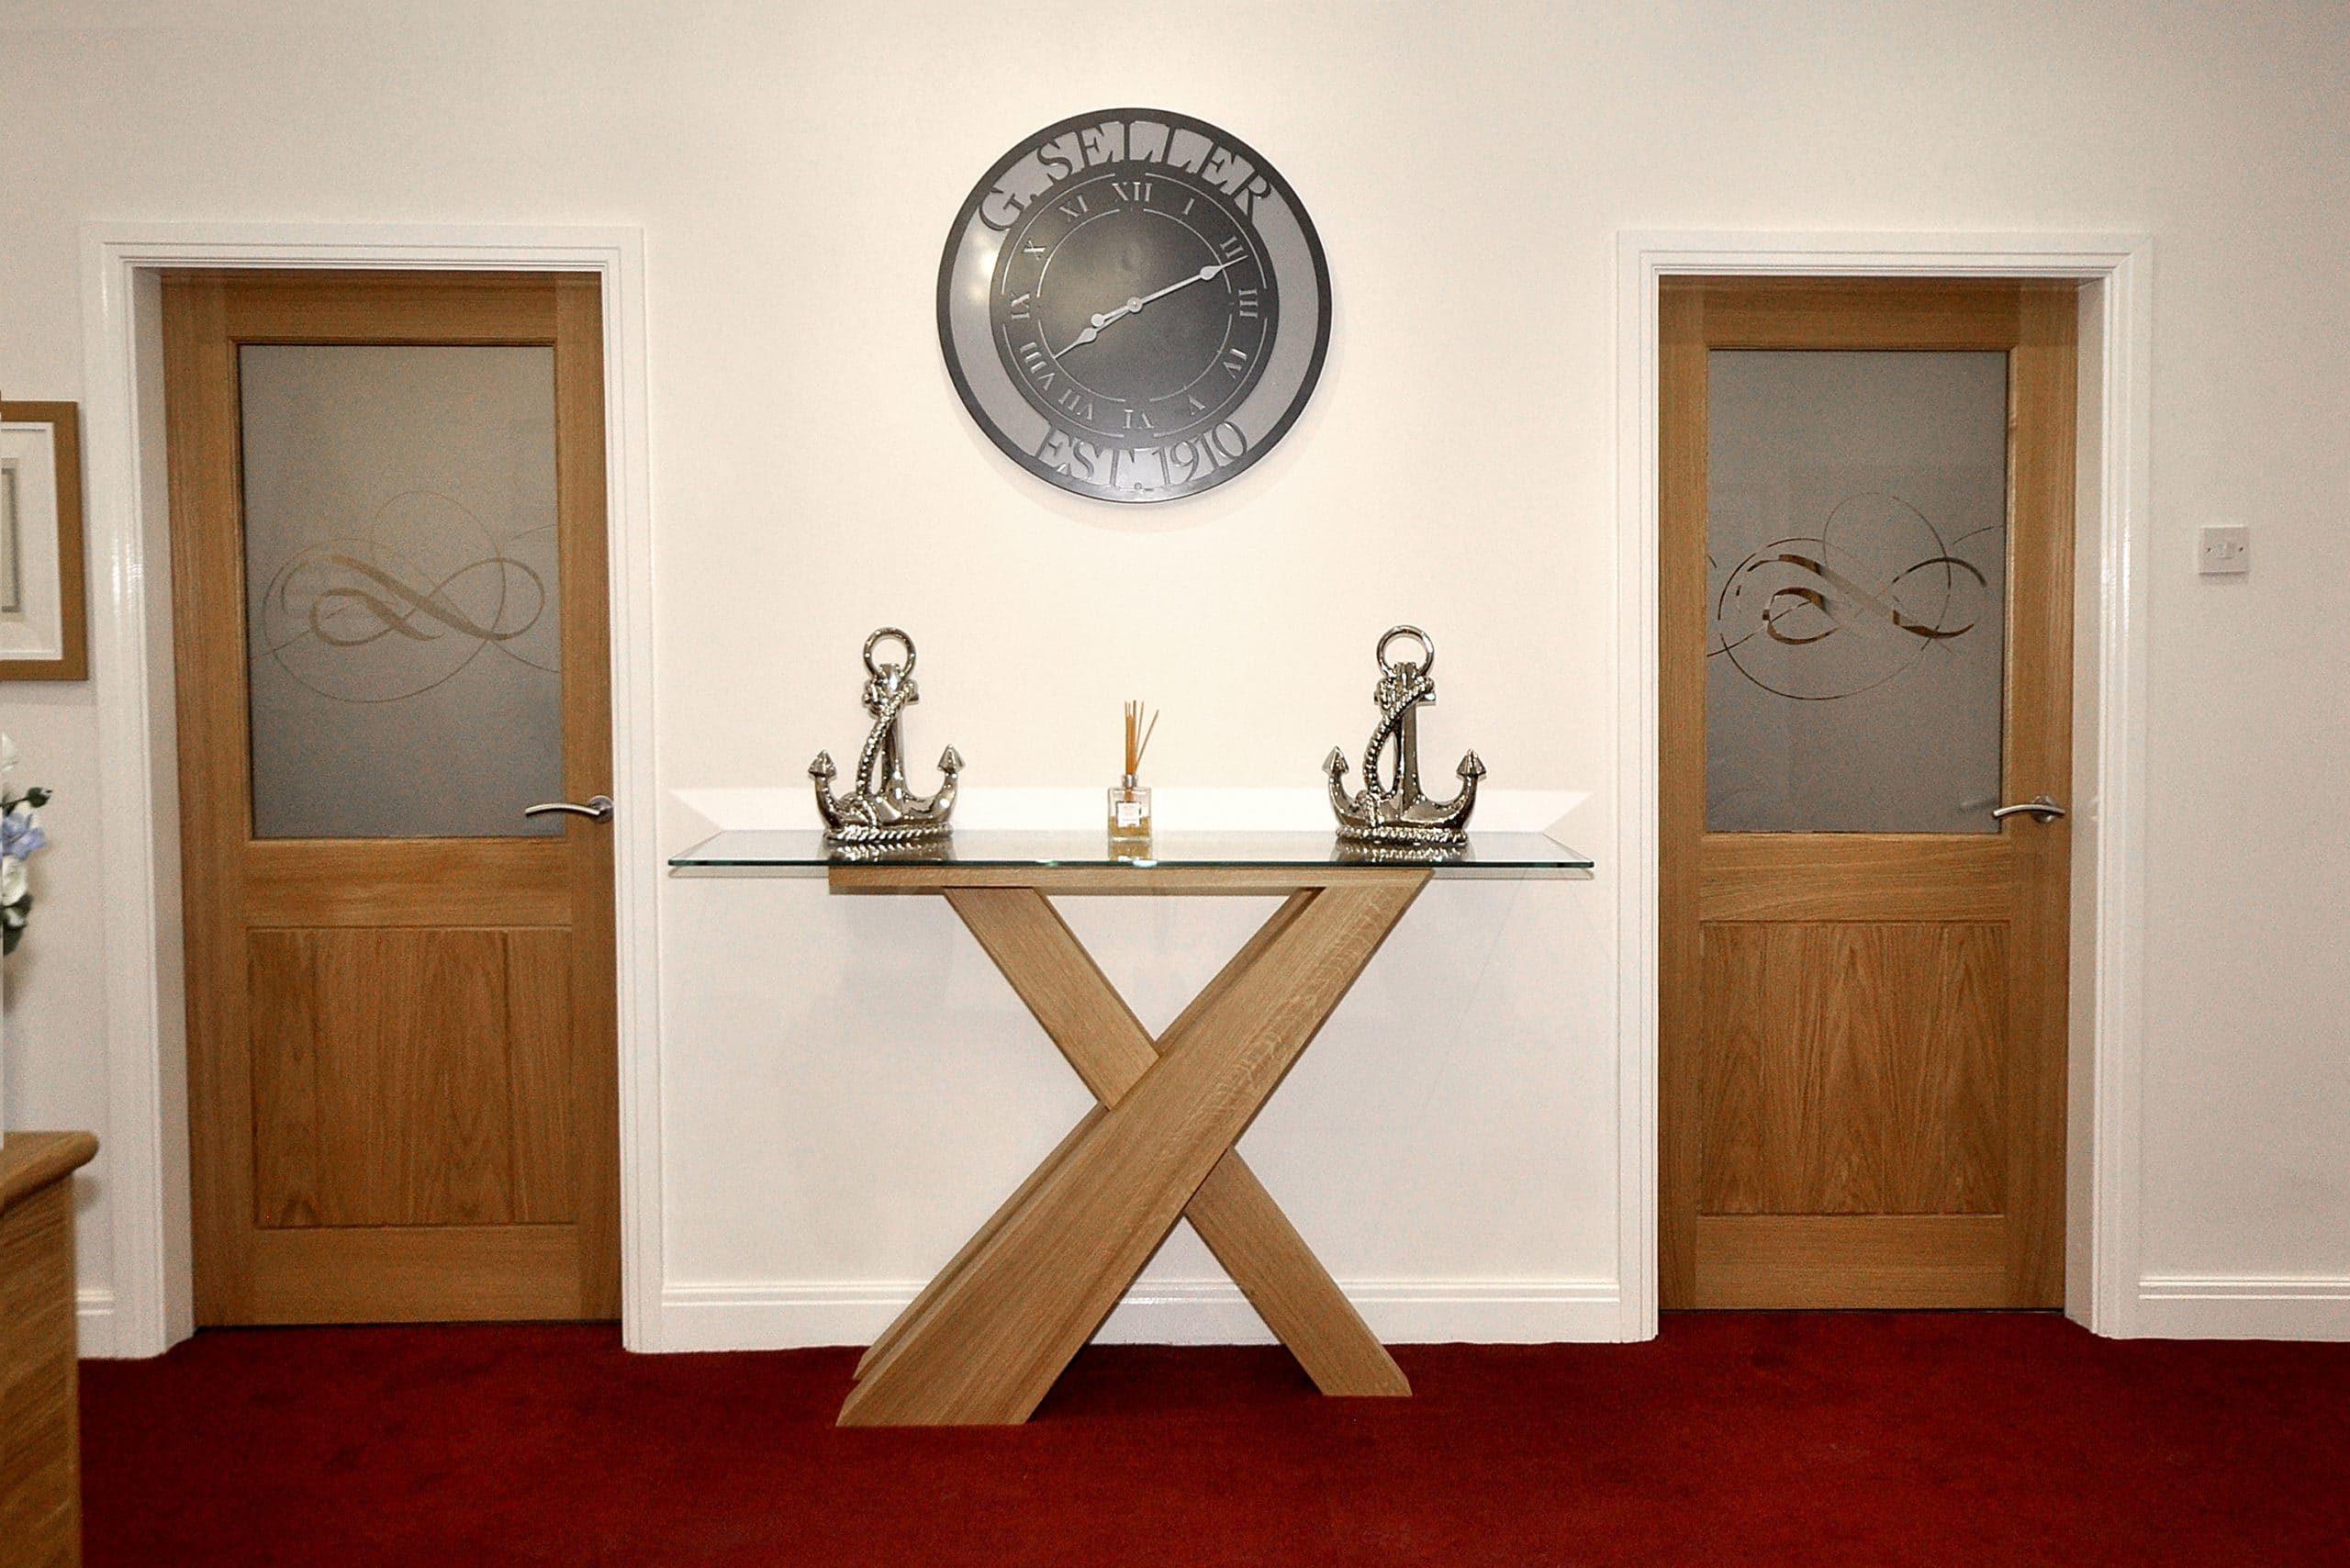 G Sellers - Inside Clock